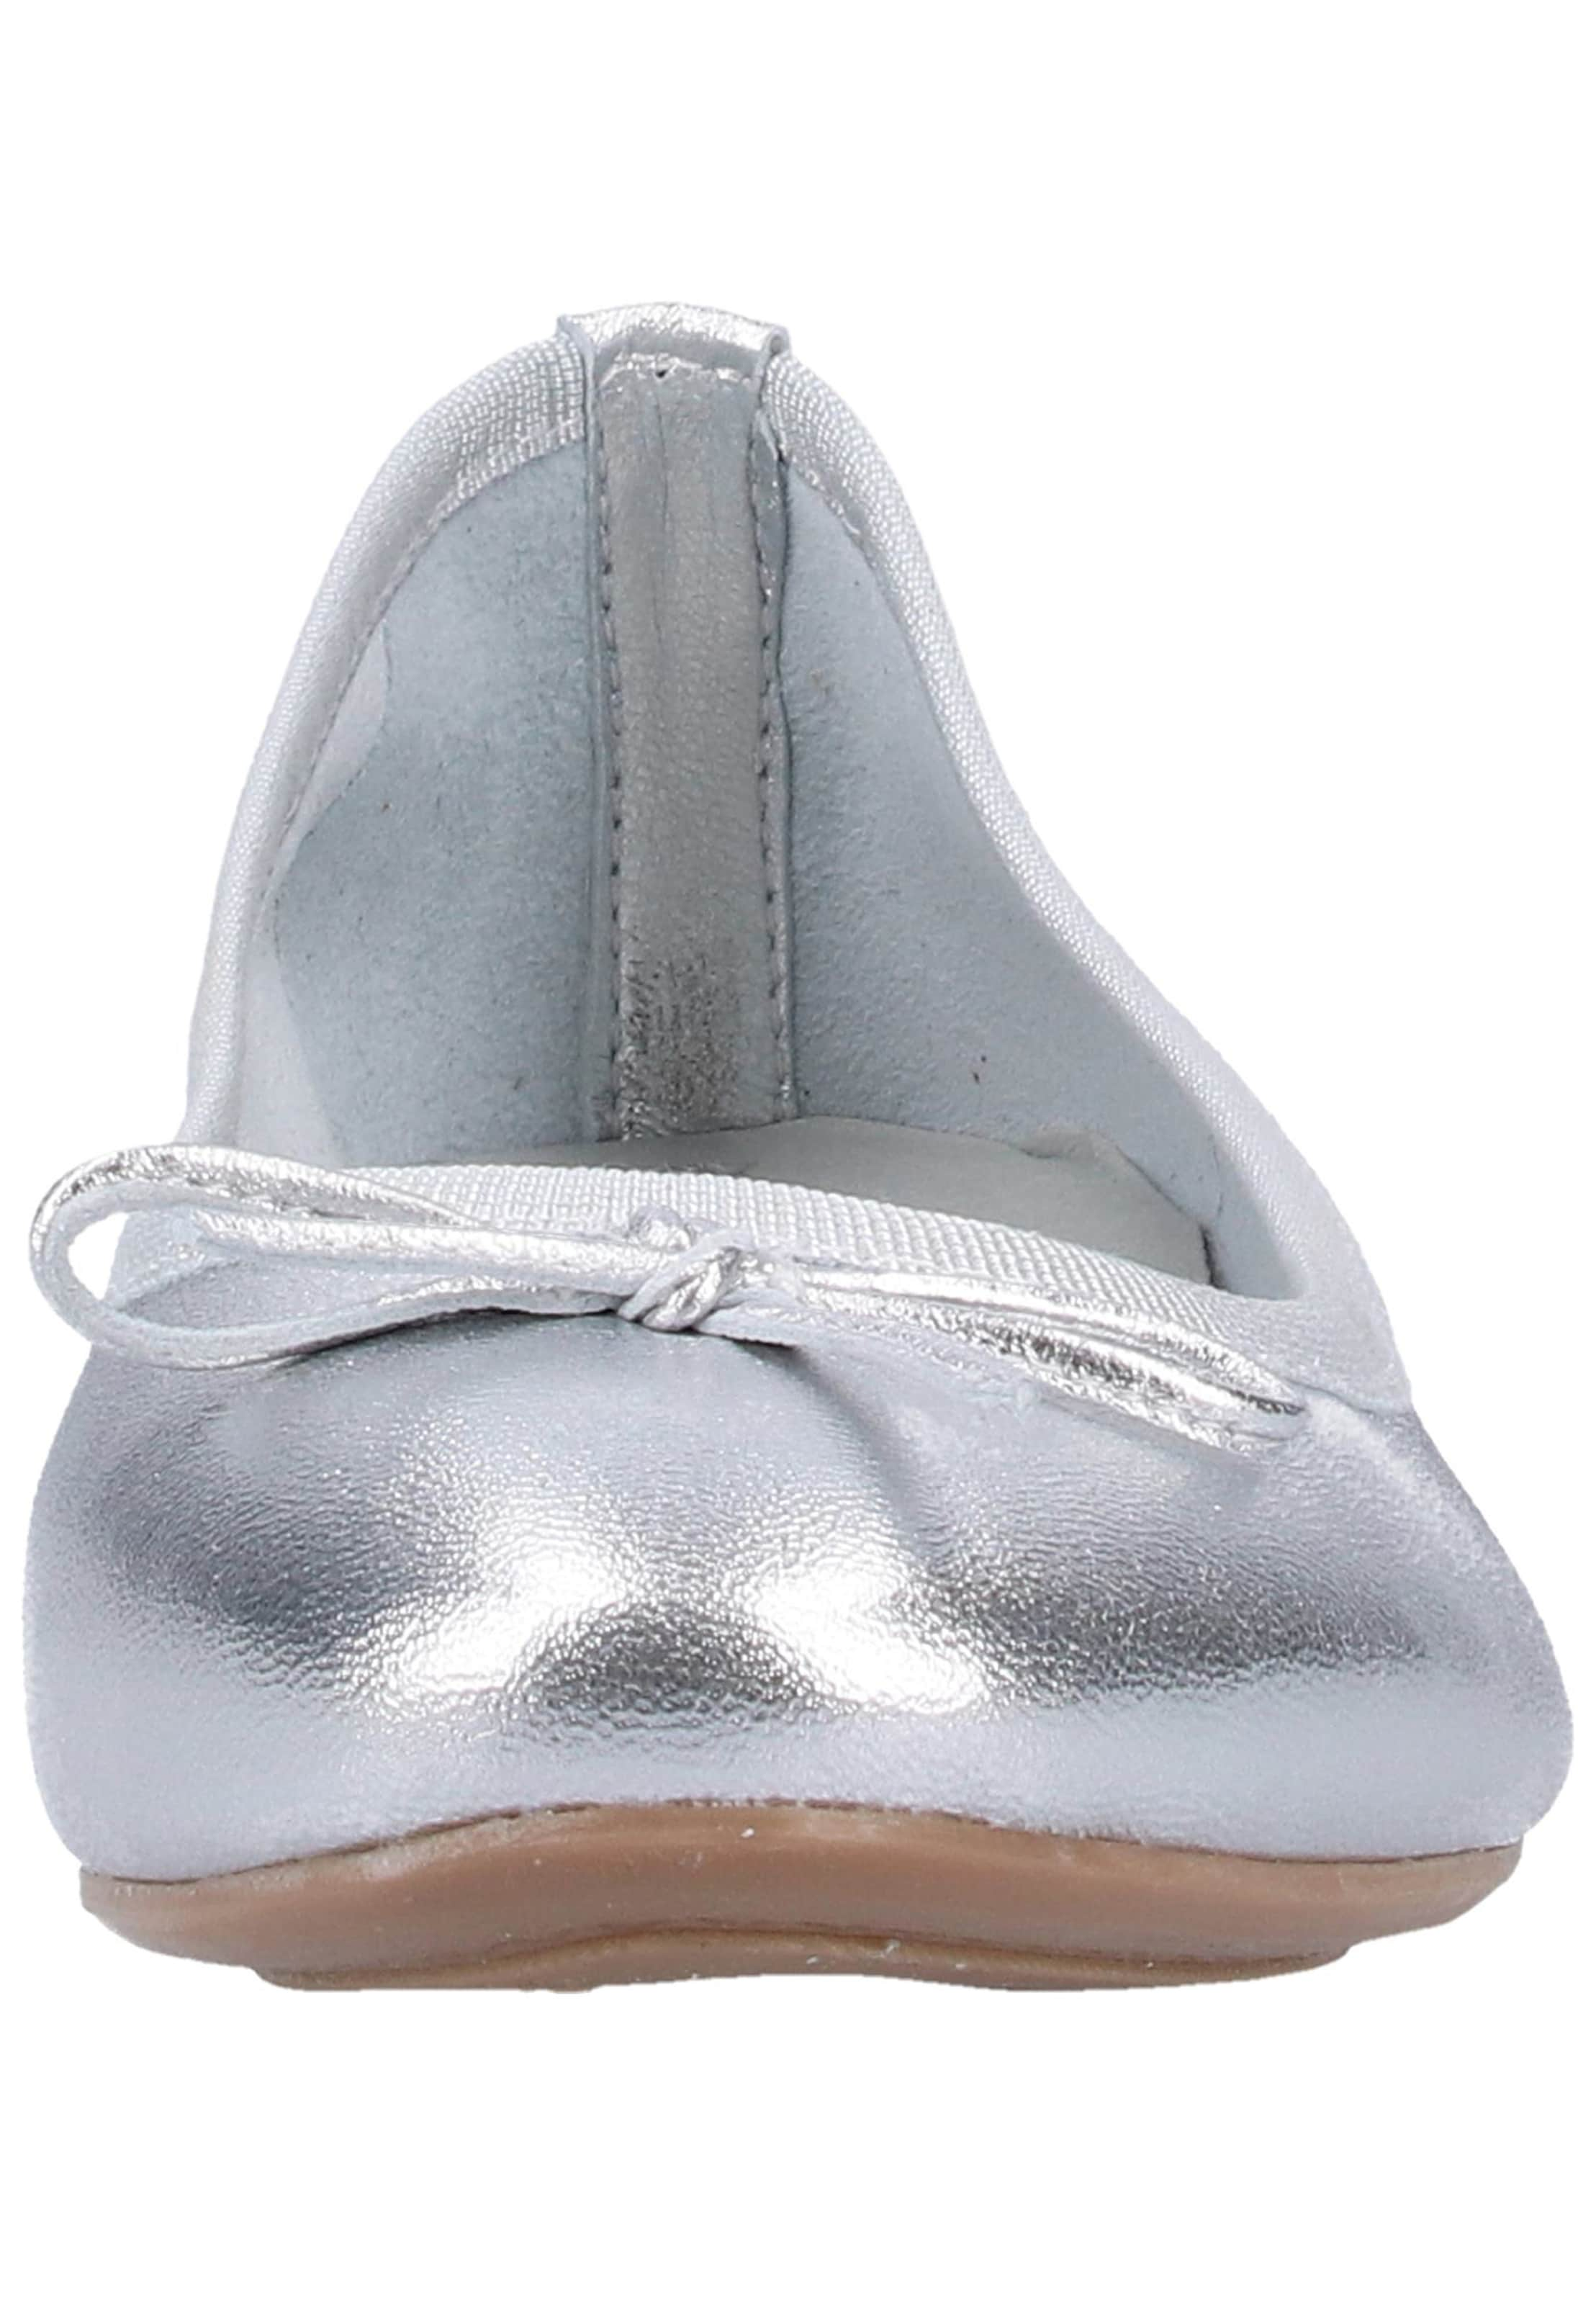 MARCO TOZZI Ballerinas Leder Bequem, gut gut gut aussehend 18307c